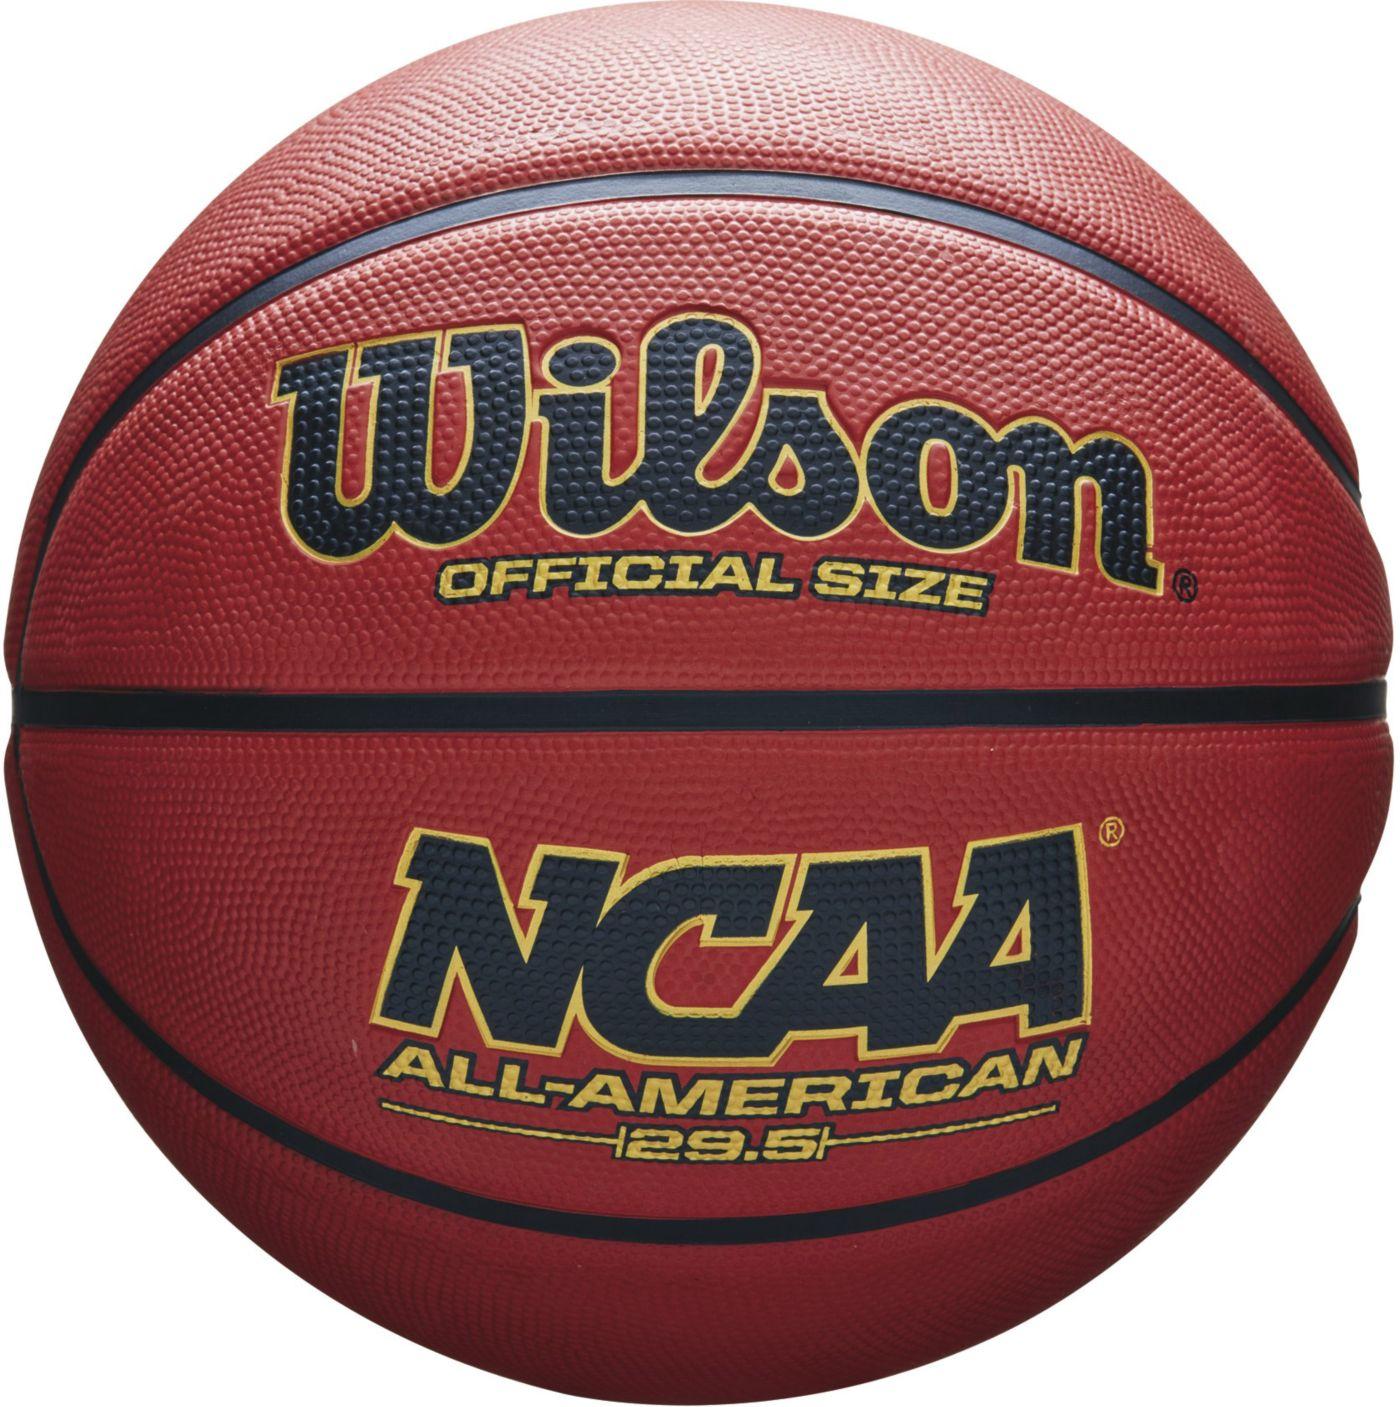 "Wilson NCAA All-American Official Basketball (29.5"")"